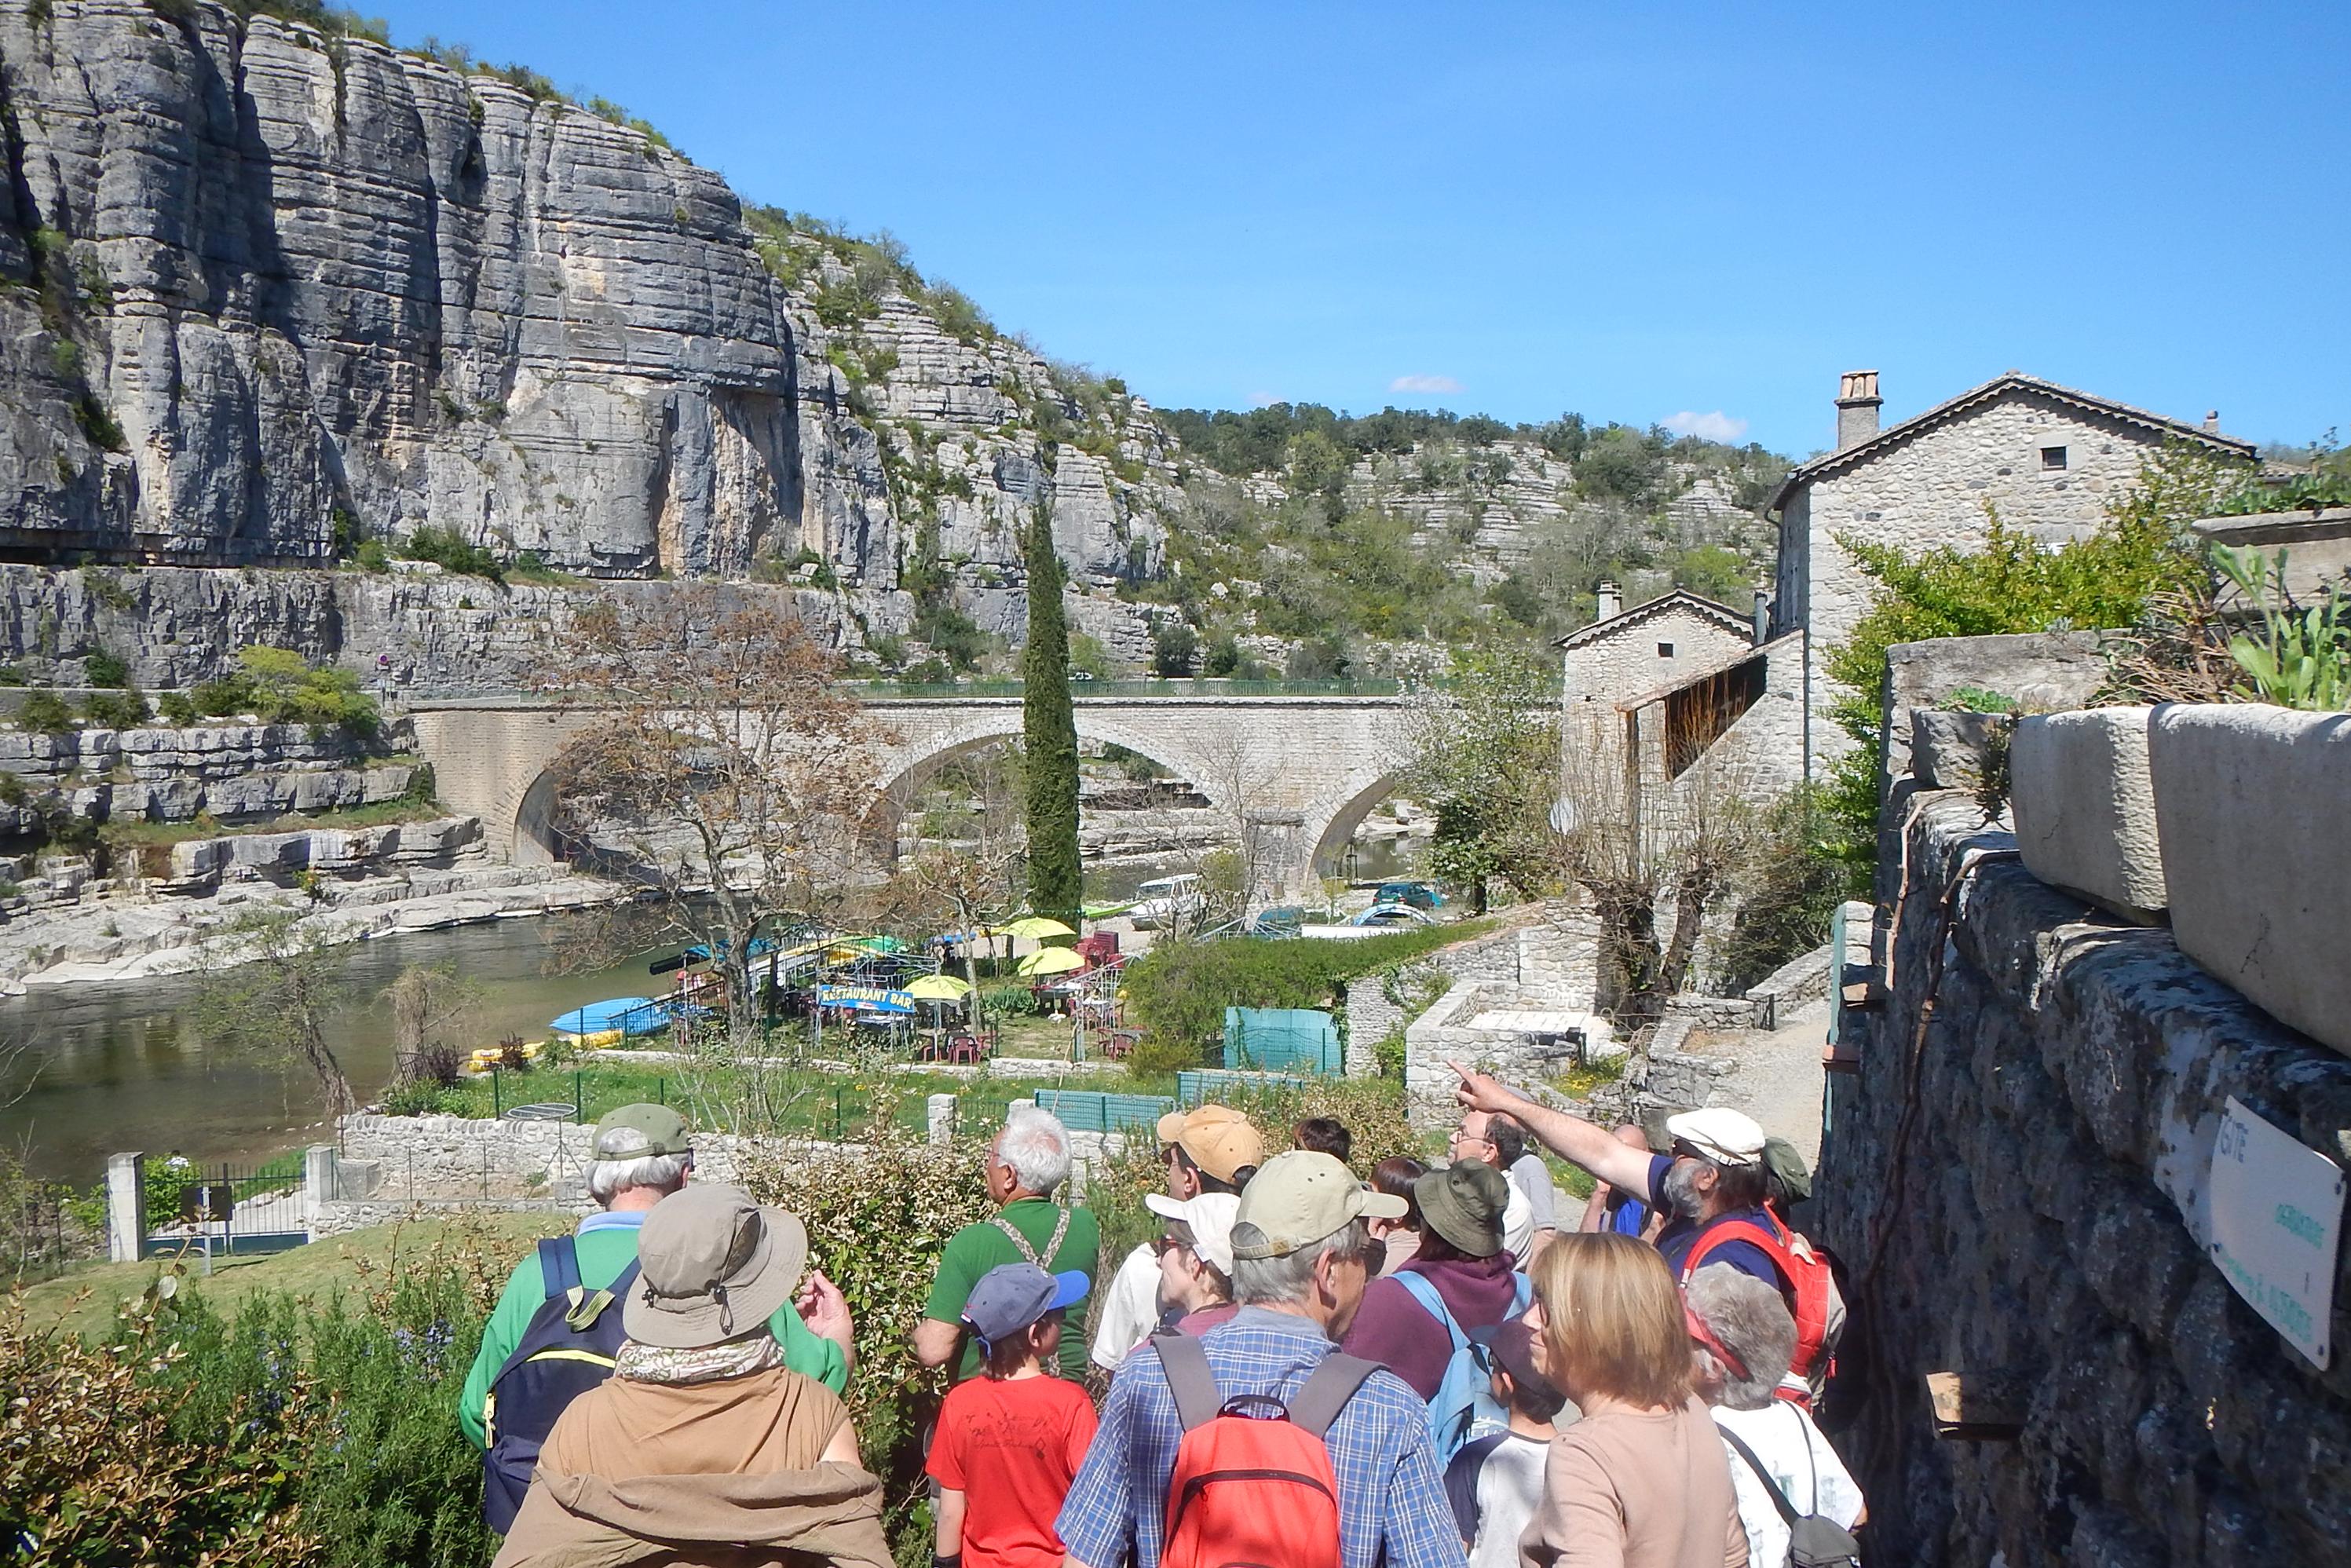 Balade à Balazuc - Muséum de l'Ardèche